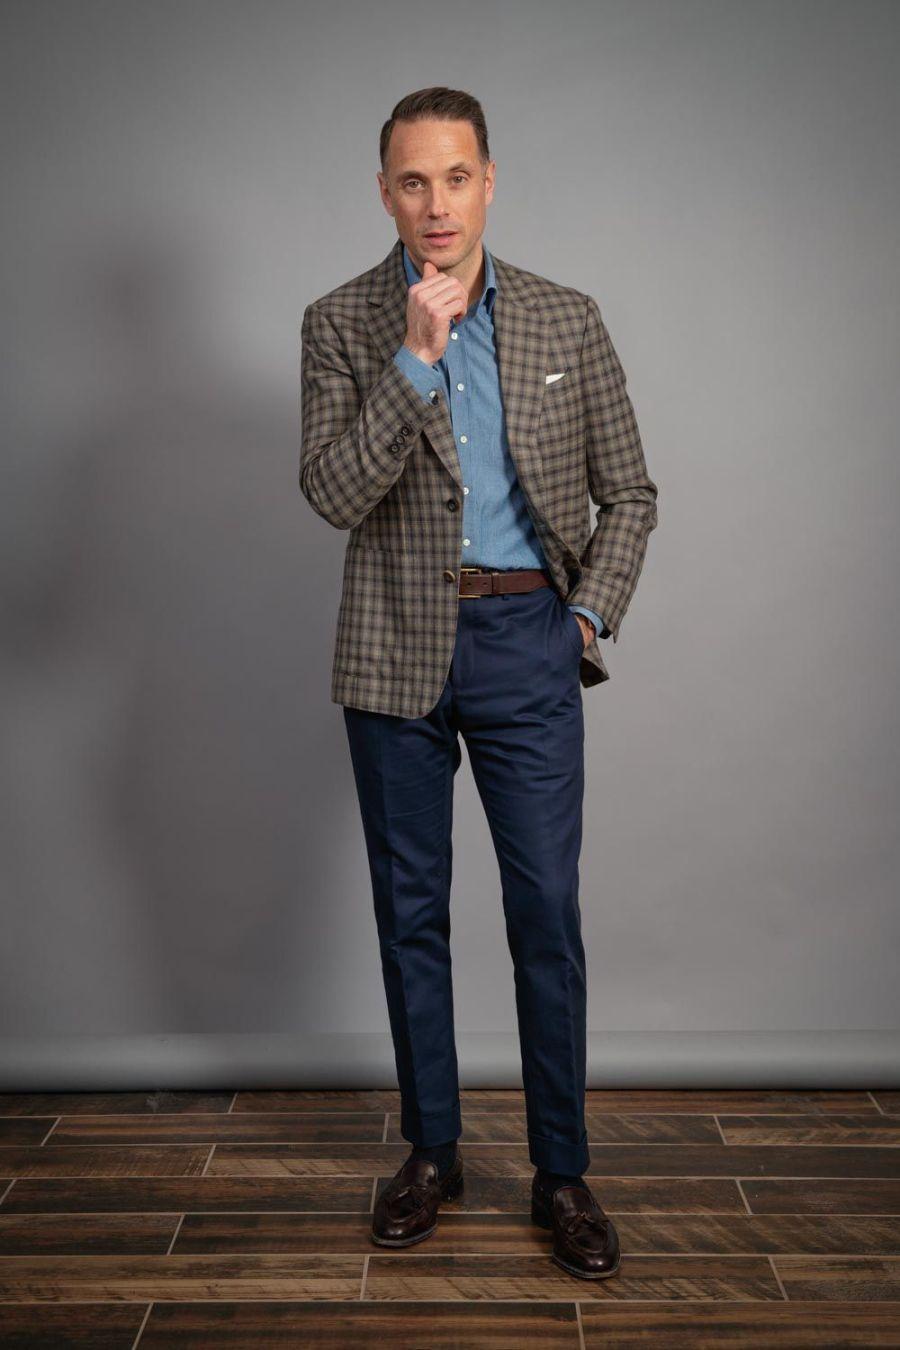 gun-club-jacket-for-men-tassel-loafers-denim-shirt-winter-capsule-wardrobe